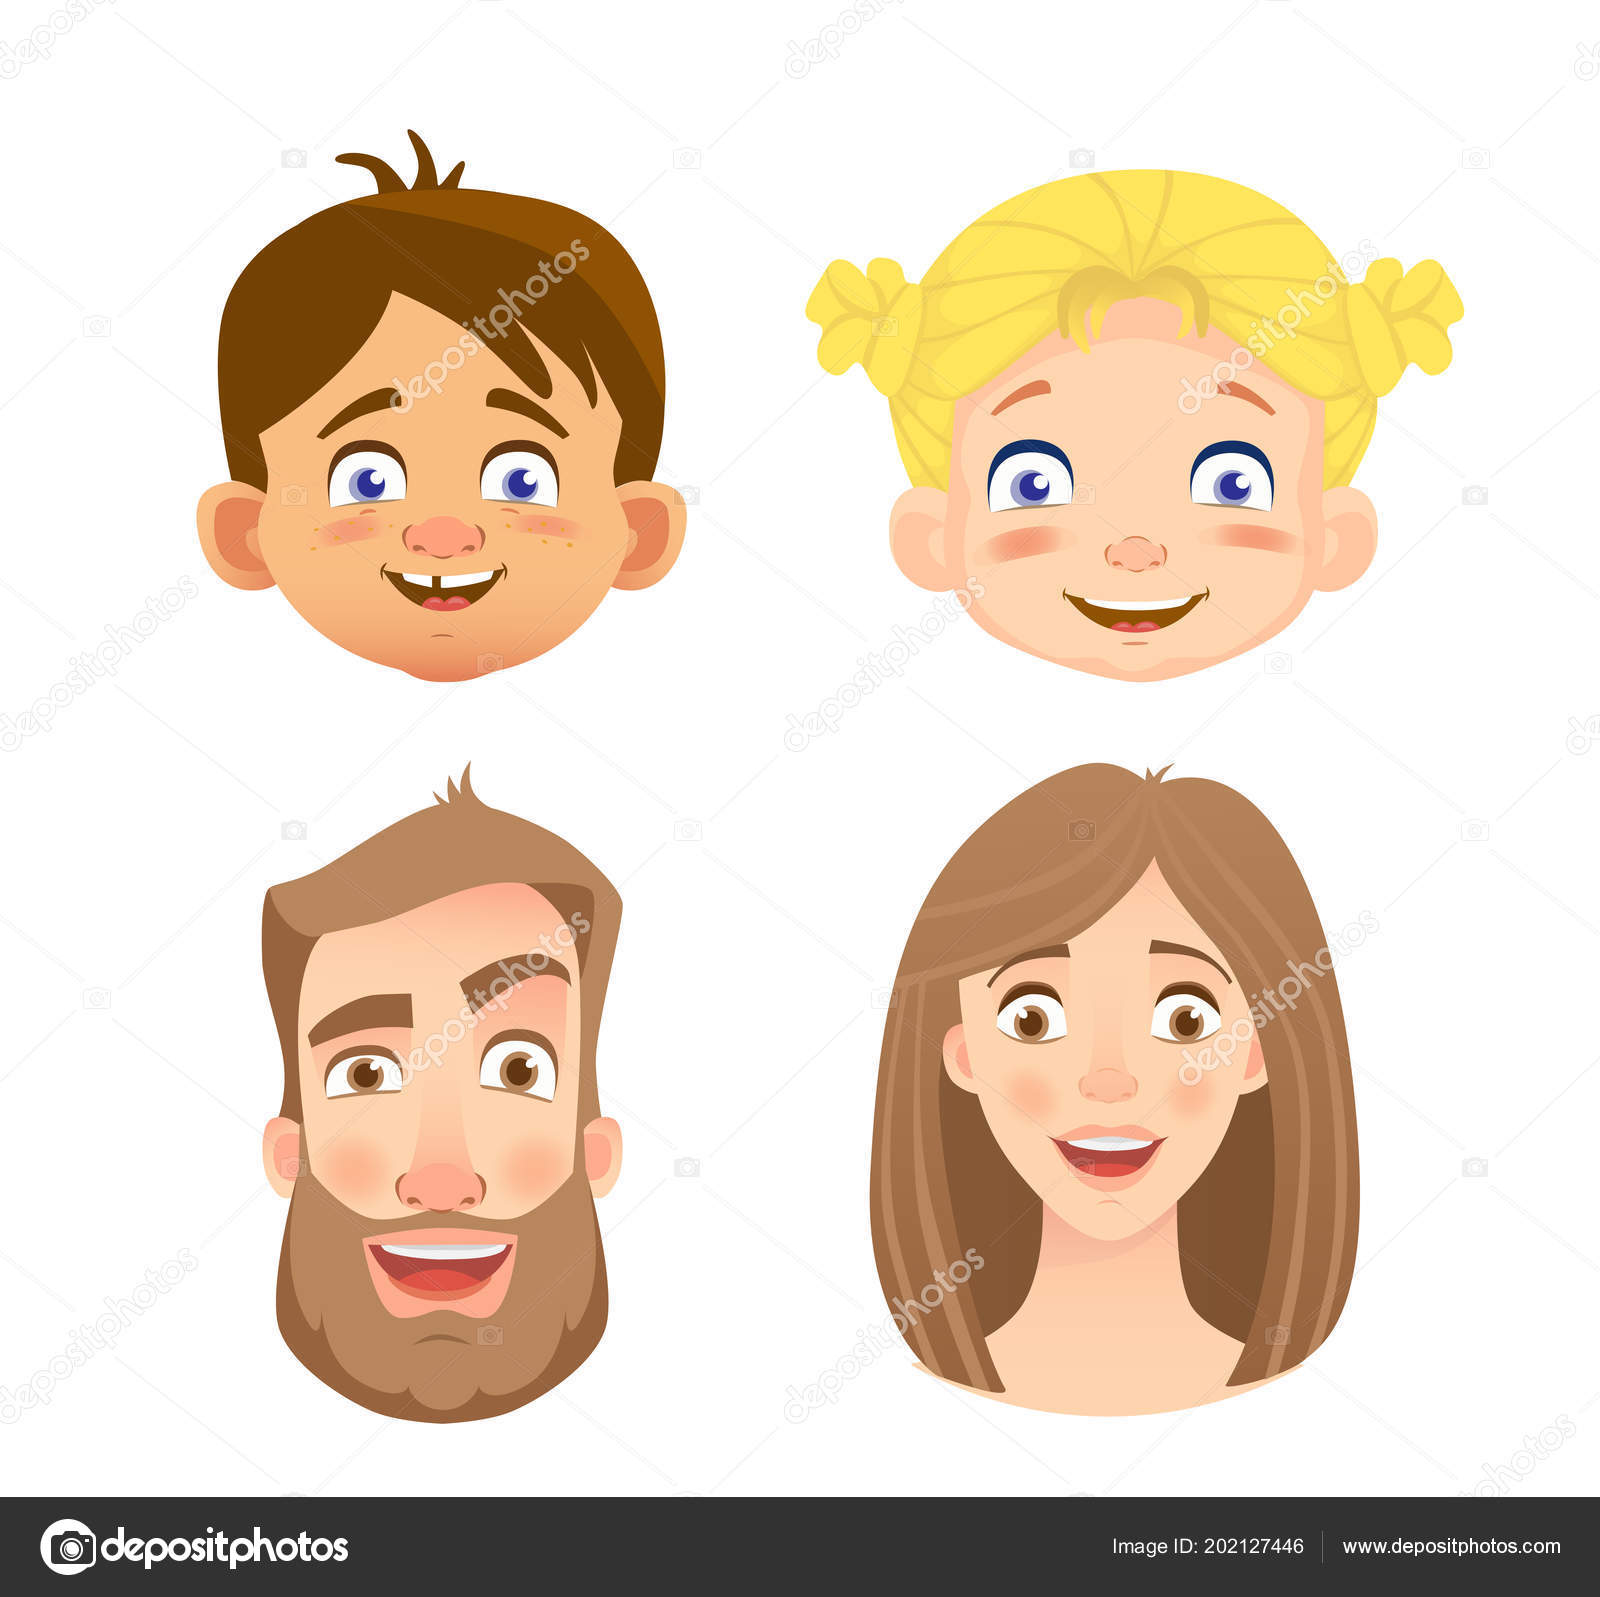 emotions human face set human faces expressing emotions illustration